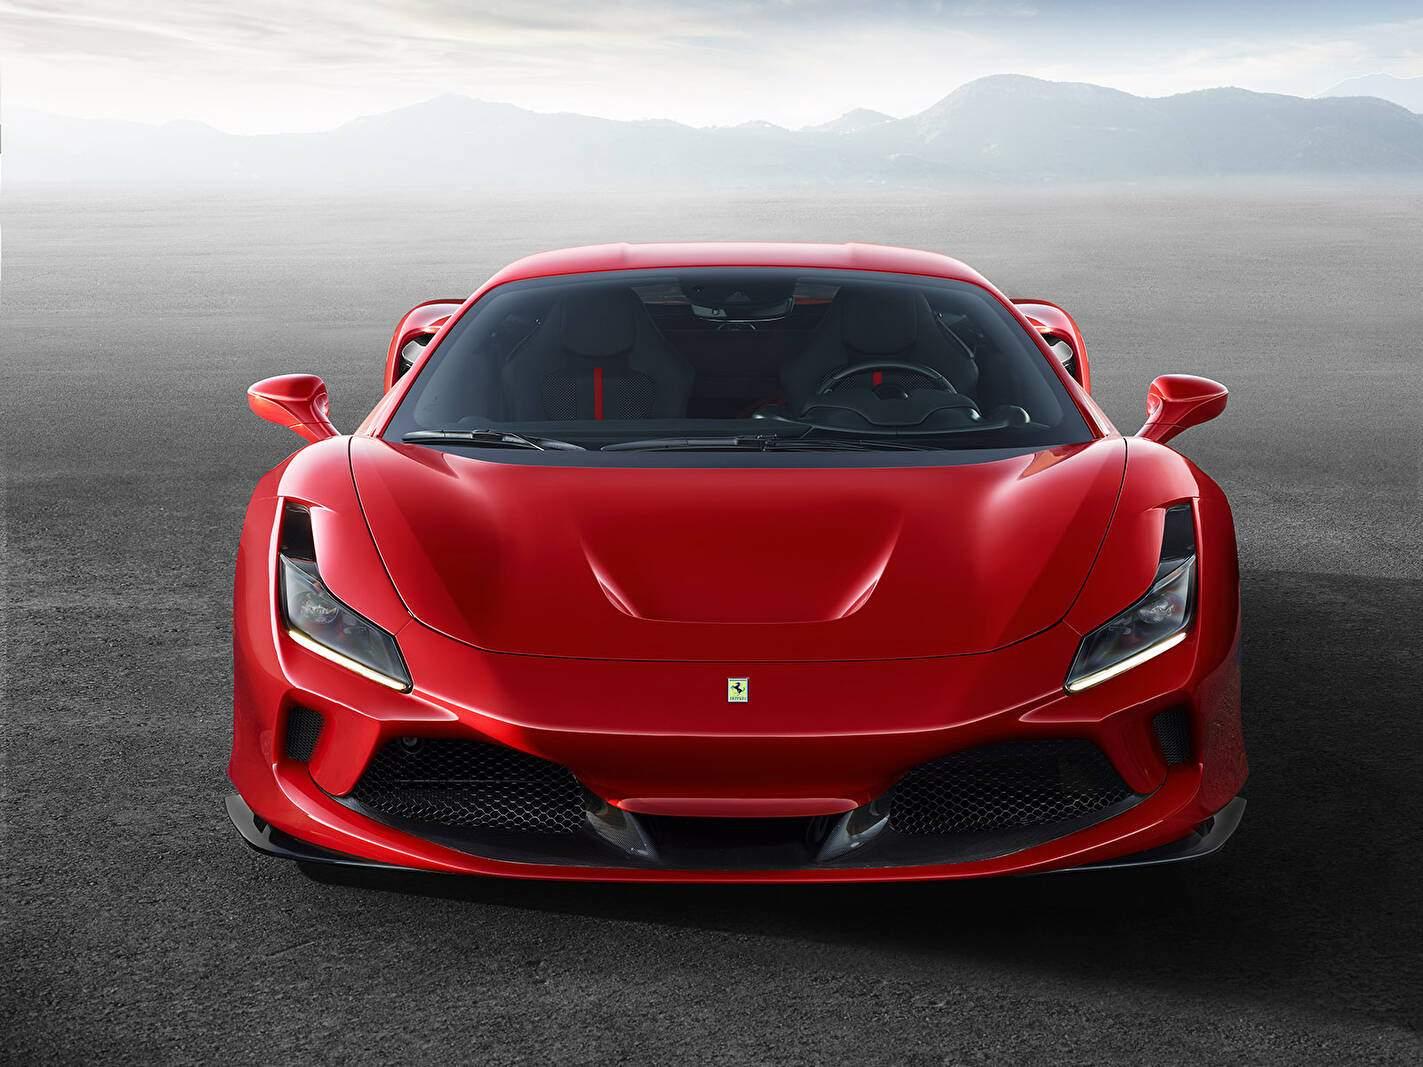 Ferrari F8 Tributo (2019),  ajouté par fox58